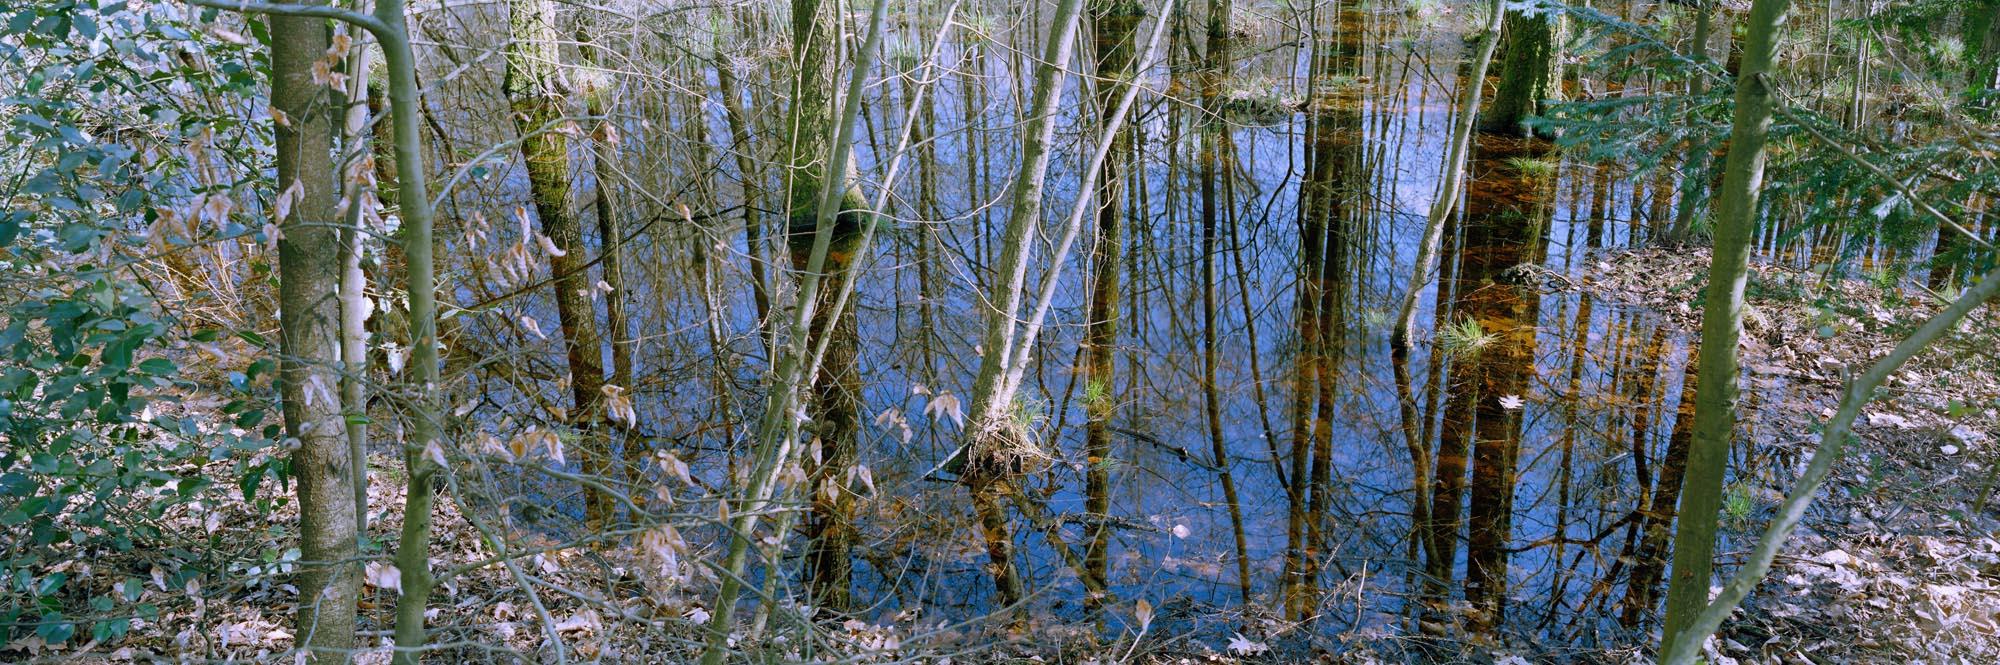 2155-06 Feuchtbiotop im Gierather Wald